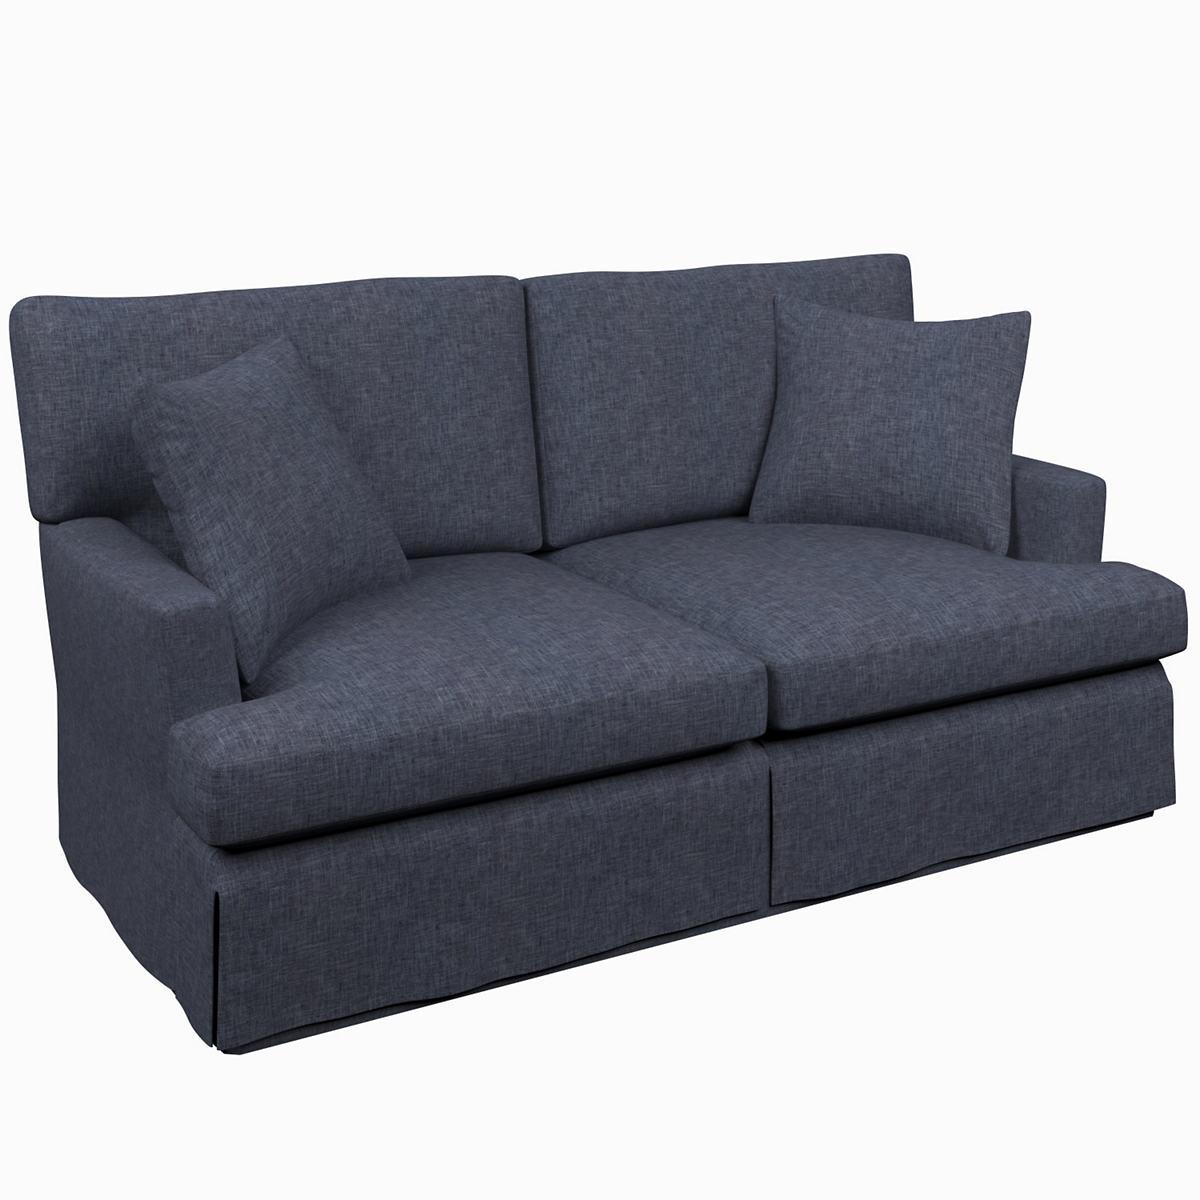 Greylock Navy Saybrook 2 Seater Sofa